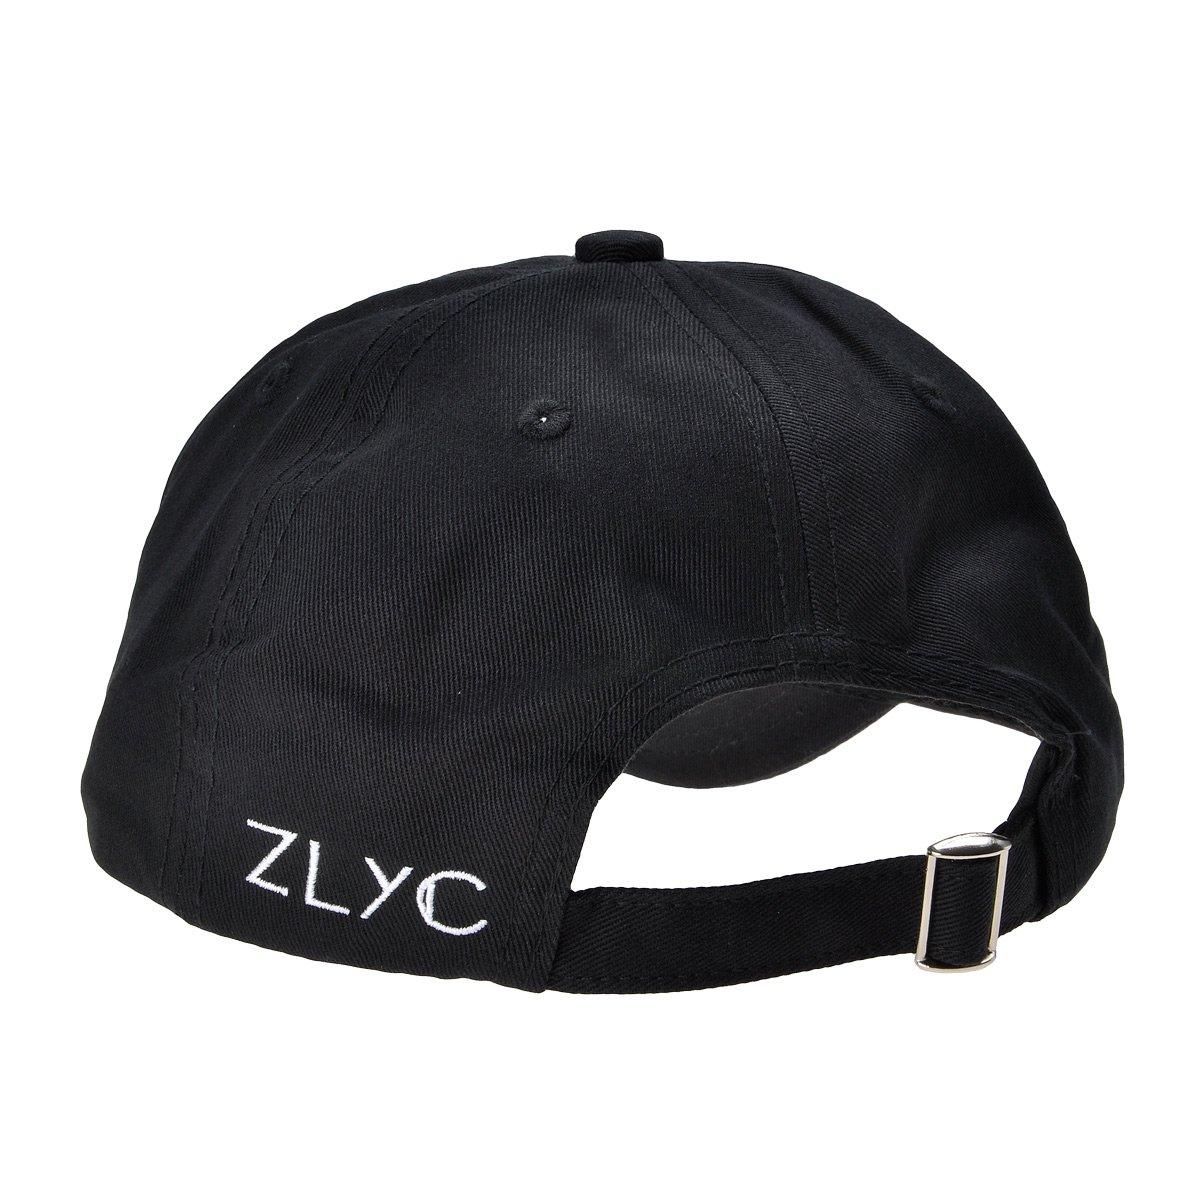 ZLYC - Gorra de béisbol - para Hombre Negro Black f8df3a94eef